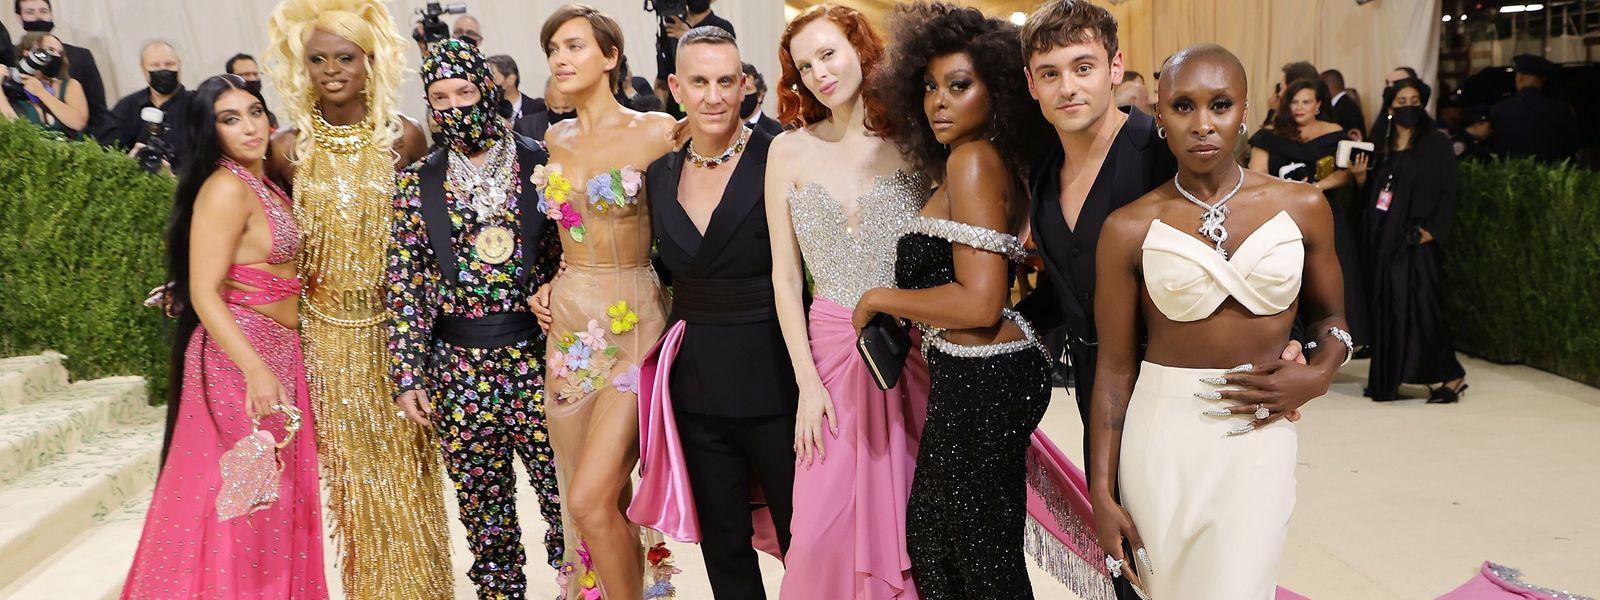 (von links): Lourdes Leon, Symone, J Balvin, Irina Shayk, Jeremy Scott, Karen Elson, Taraji P. Henson, Tom Daley und Cynthia Erivobei der Met-Gala 2021.